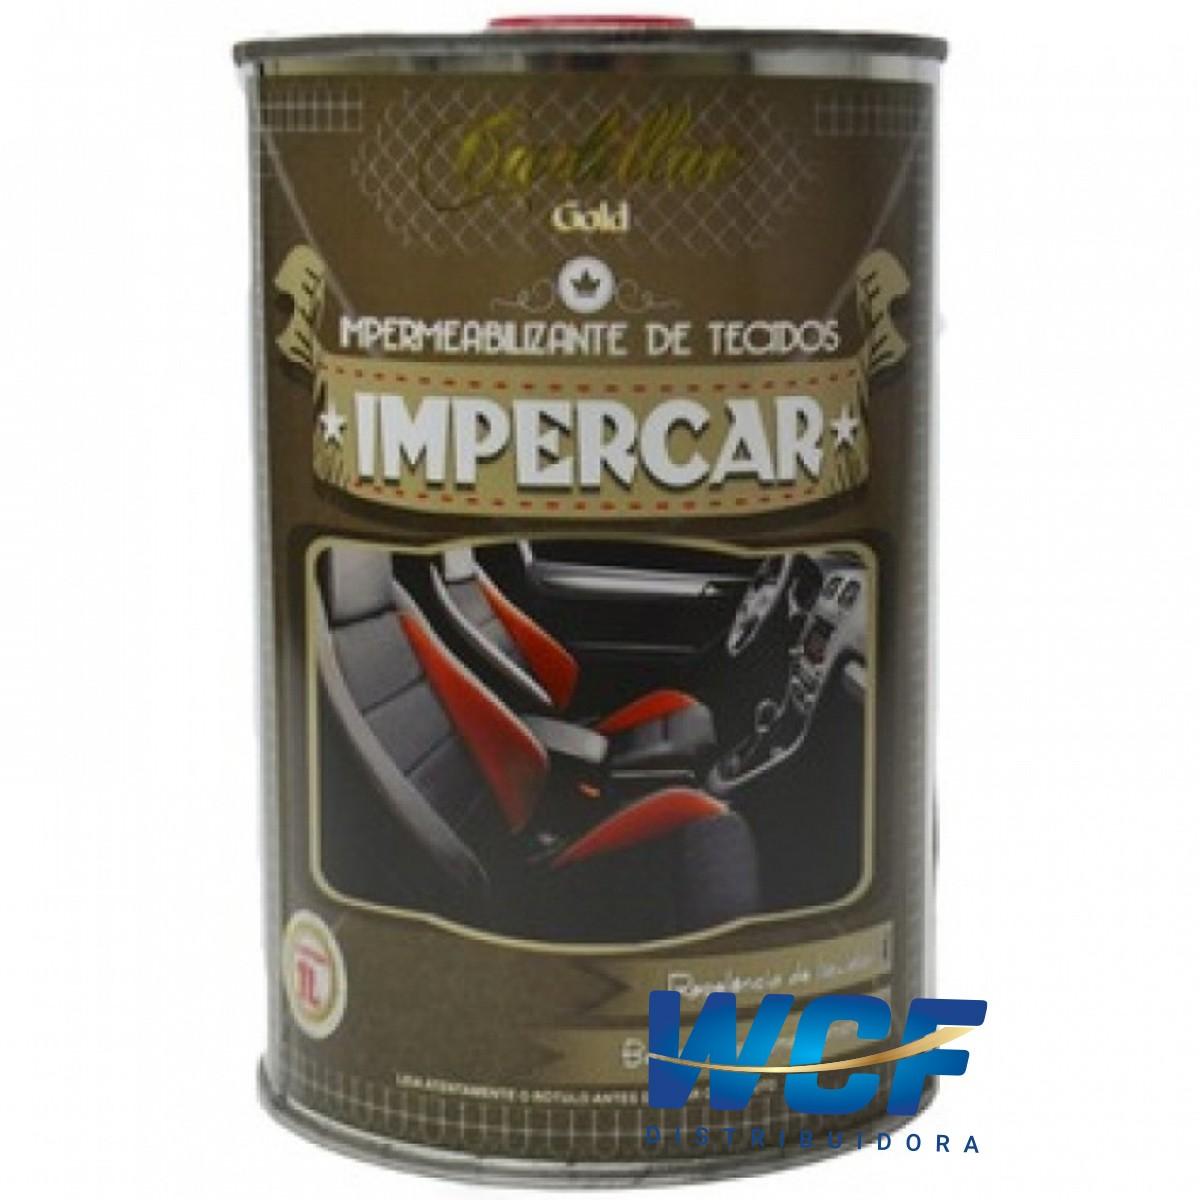 CADILLAC IMPERCAR IMPERMEABILIZANTE TECIDOS 1LT